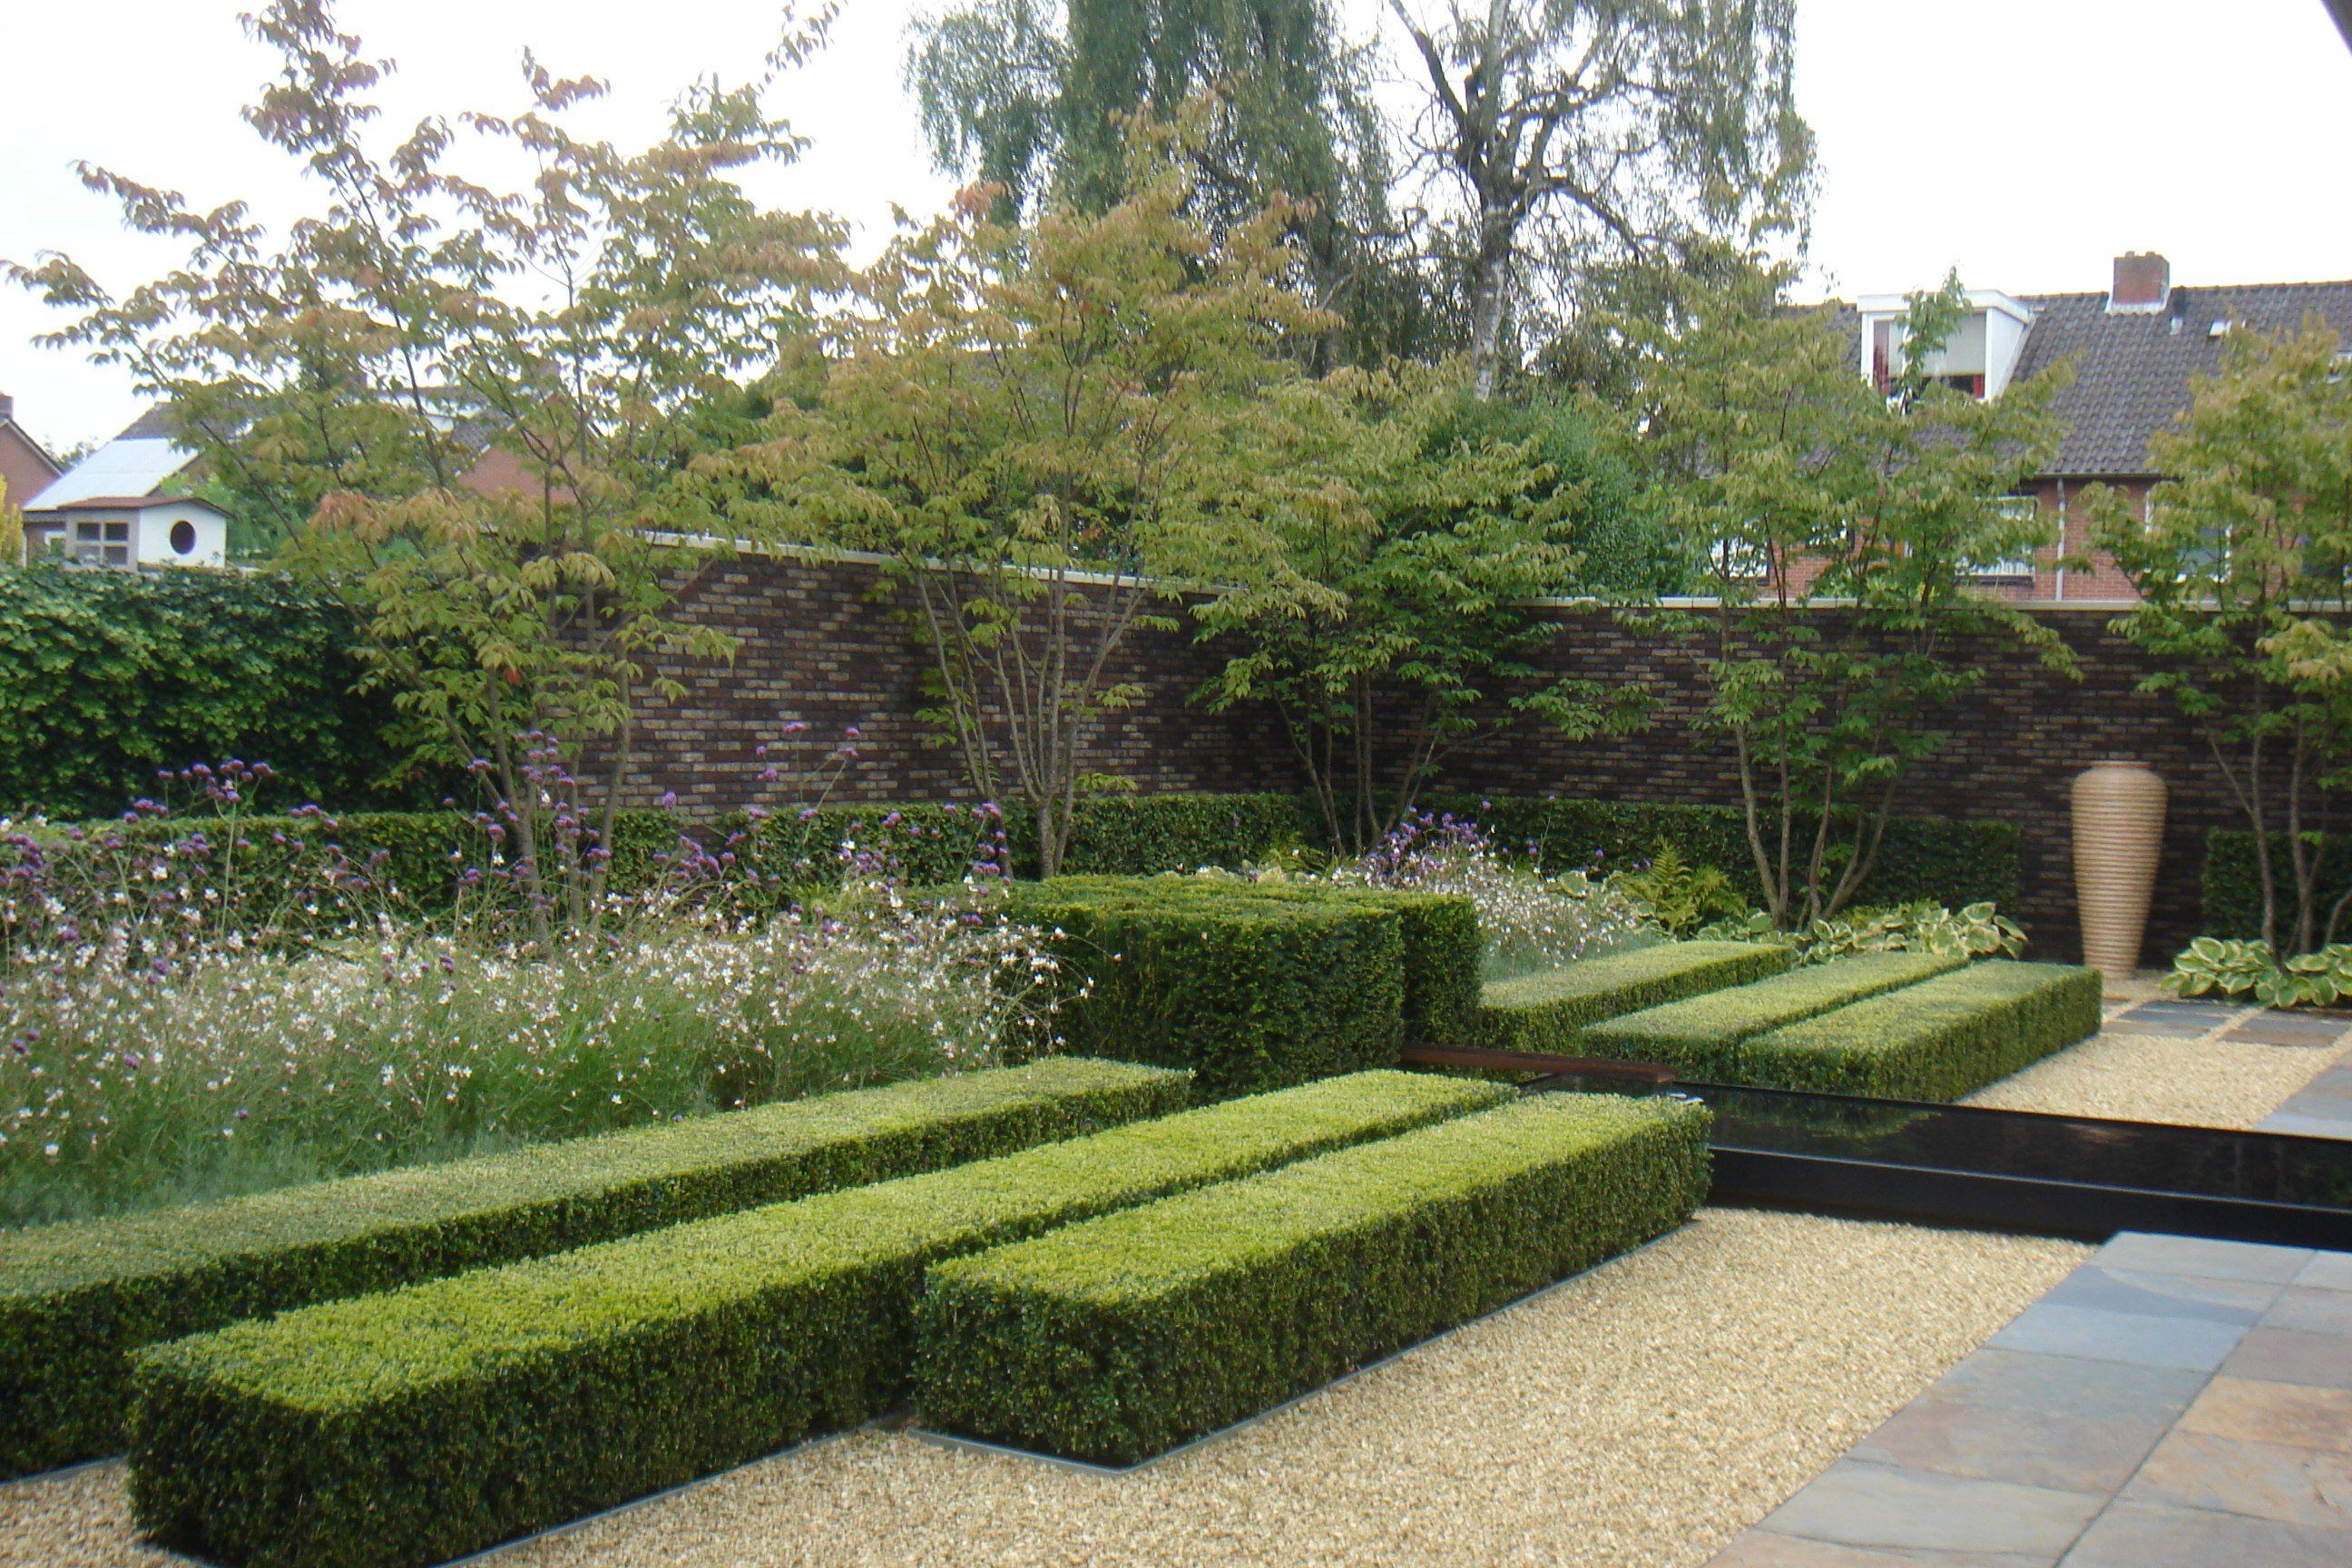 1000 Images About Garden Design Ideas On Pinterest